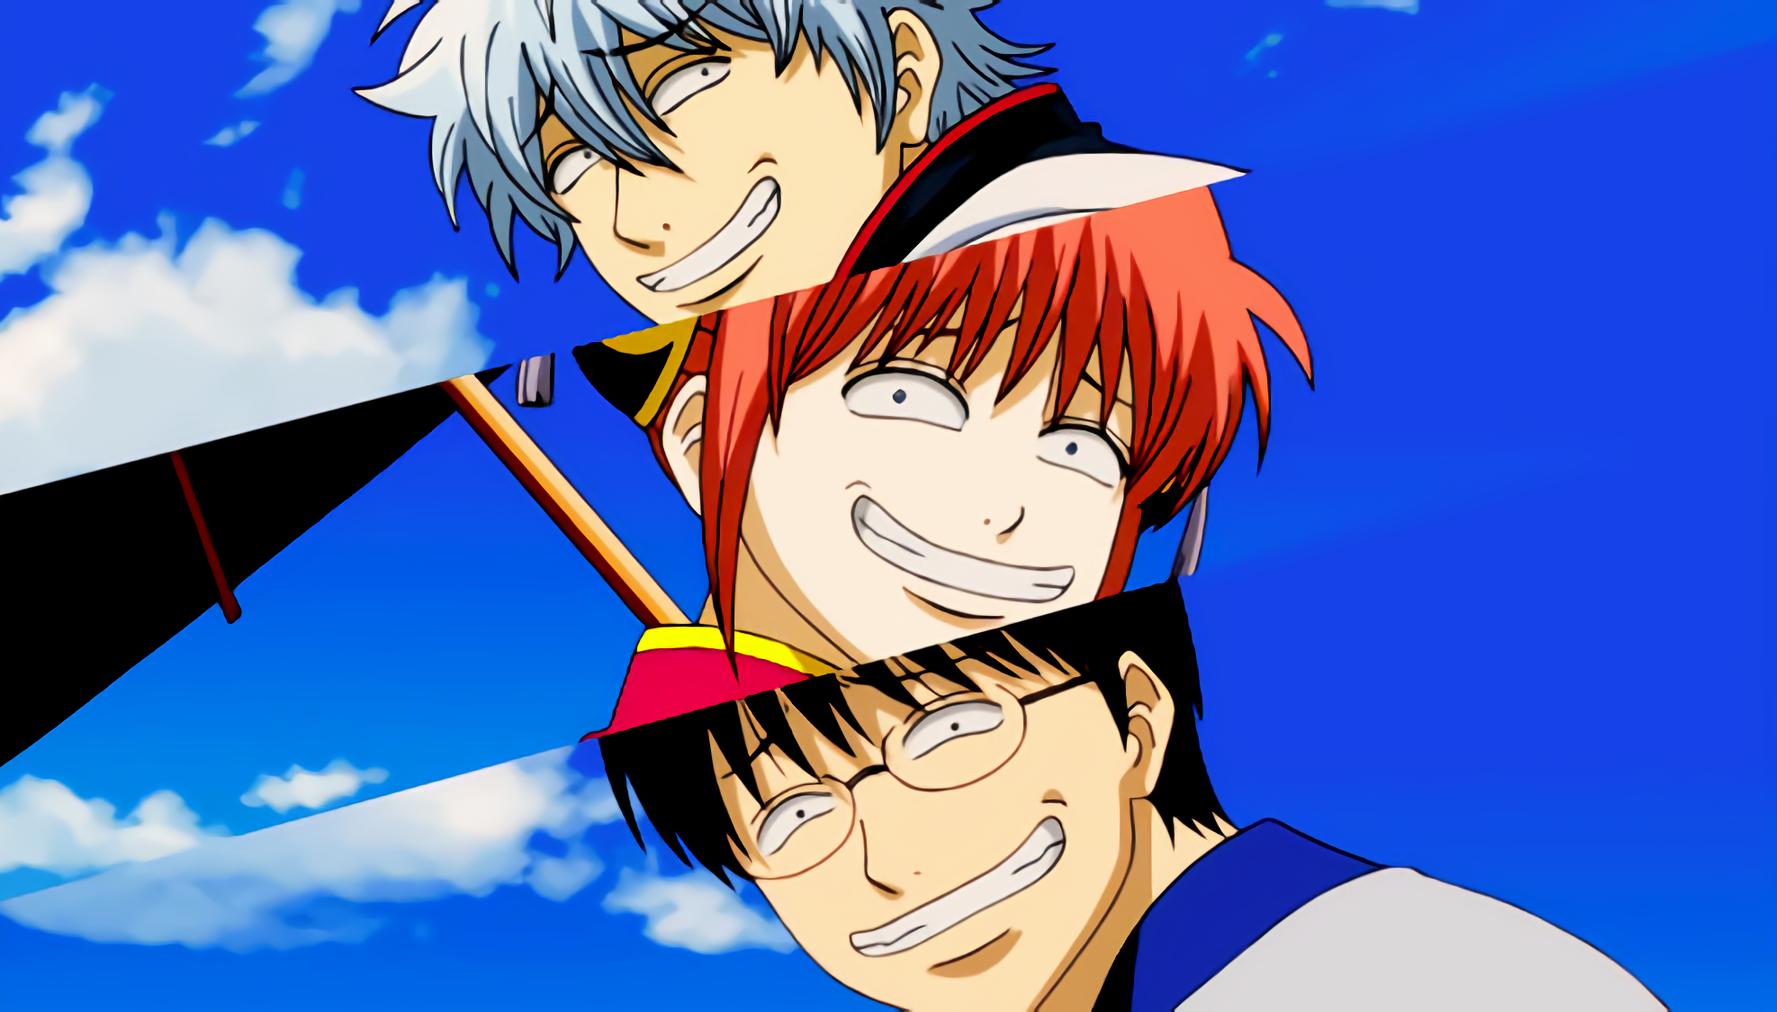 Streaming Anime Kini Juga Bisa Lewat Steam!